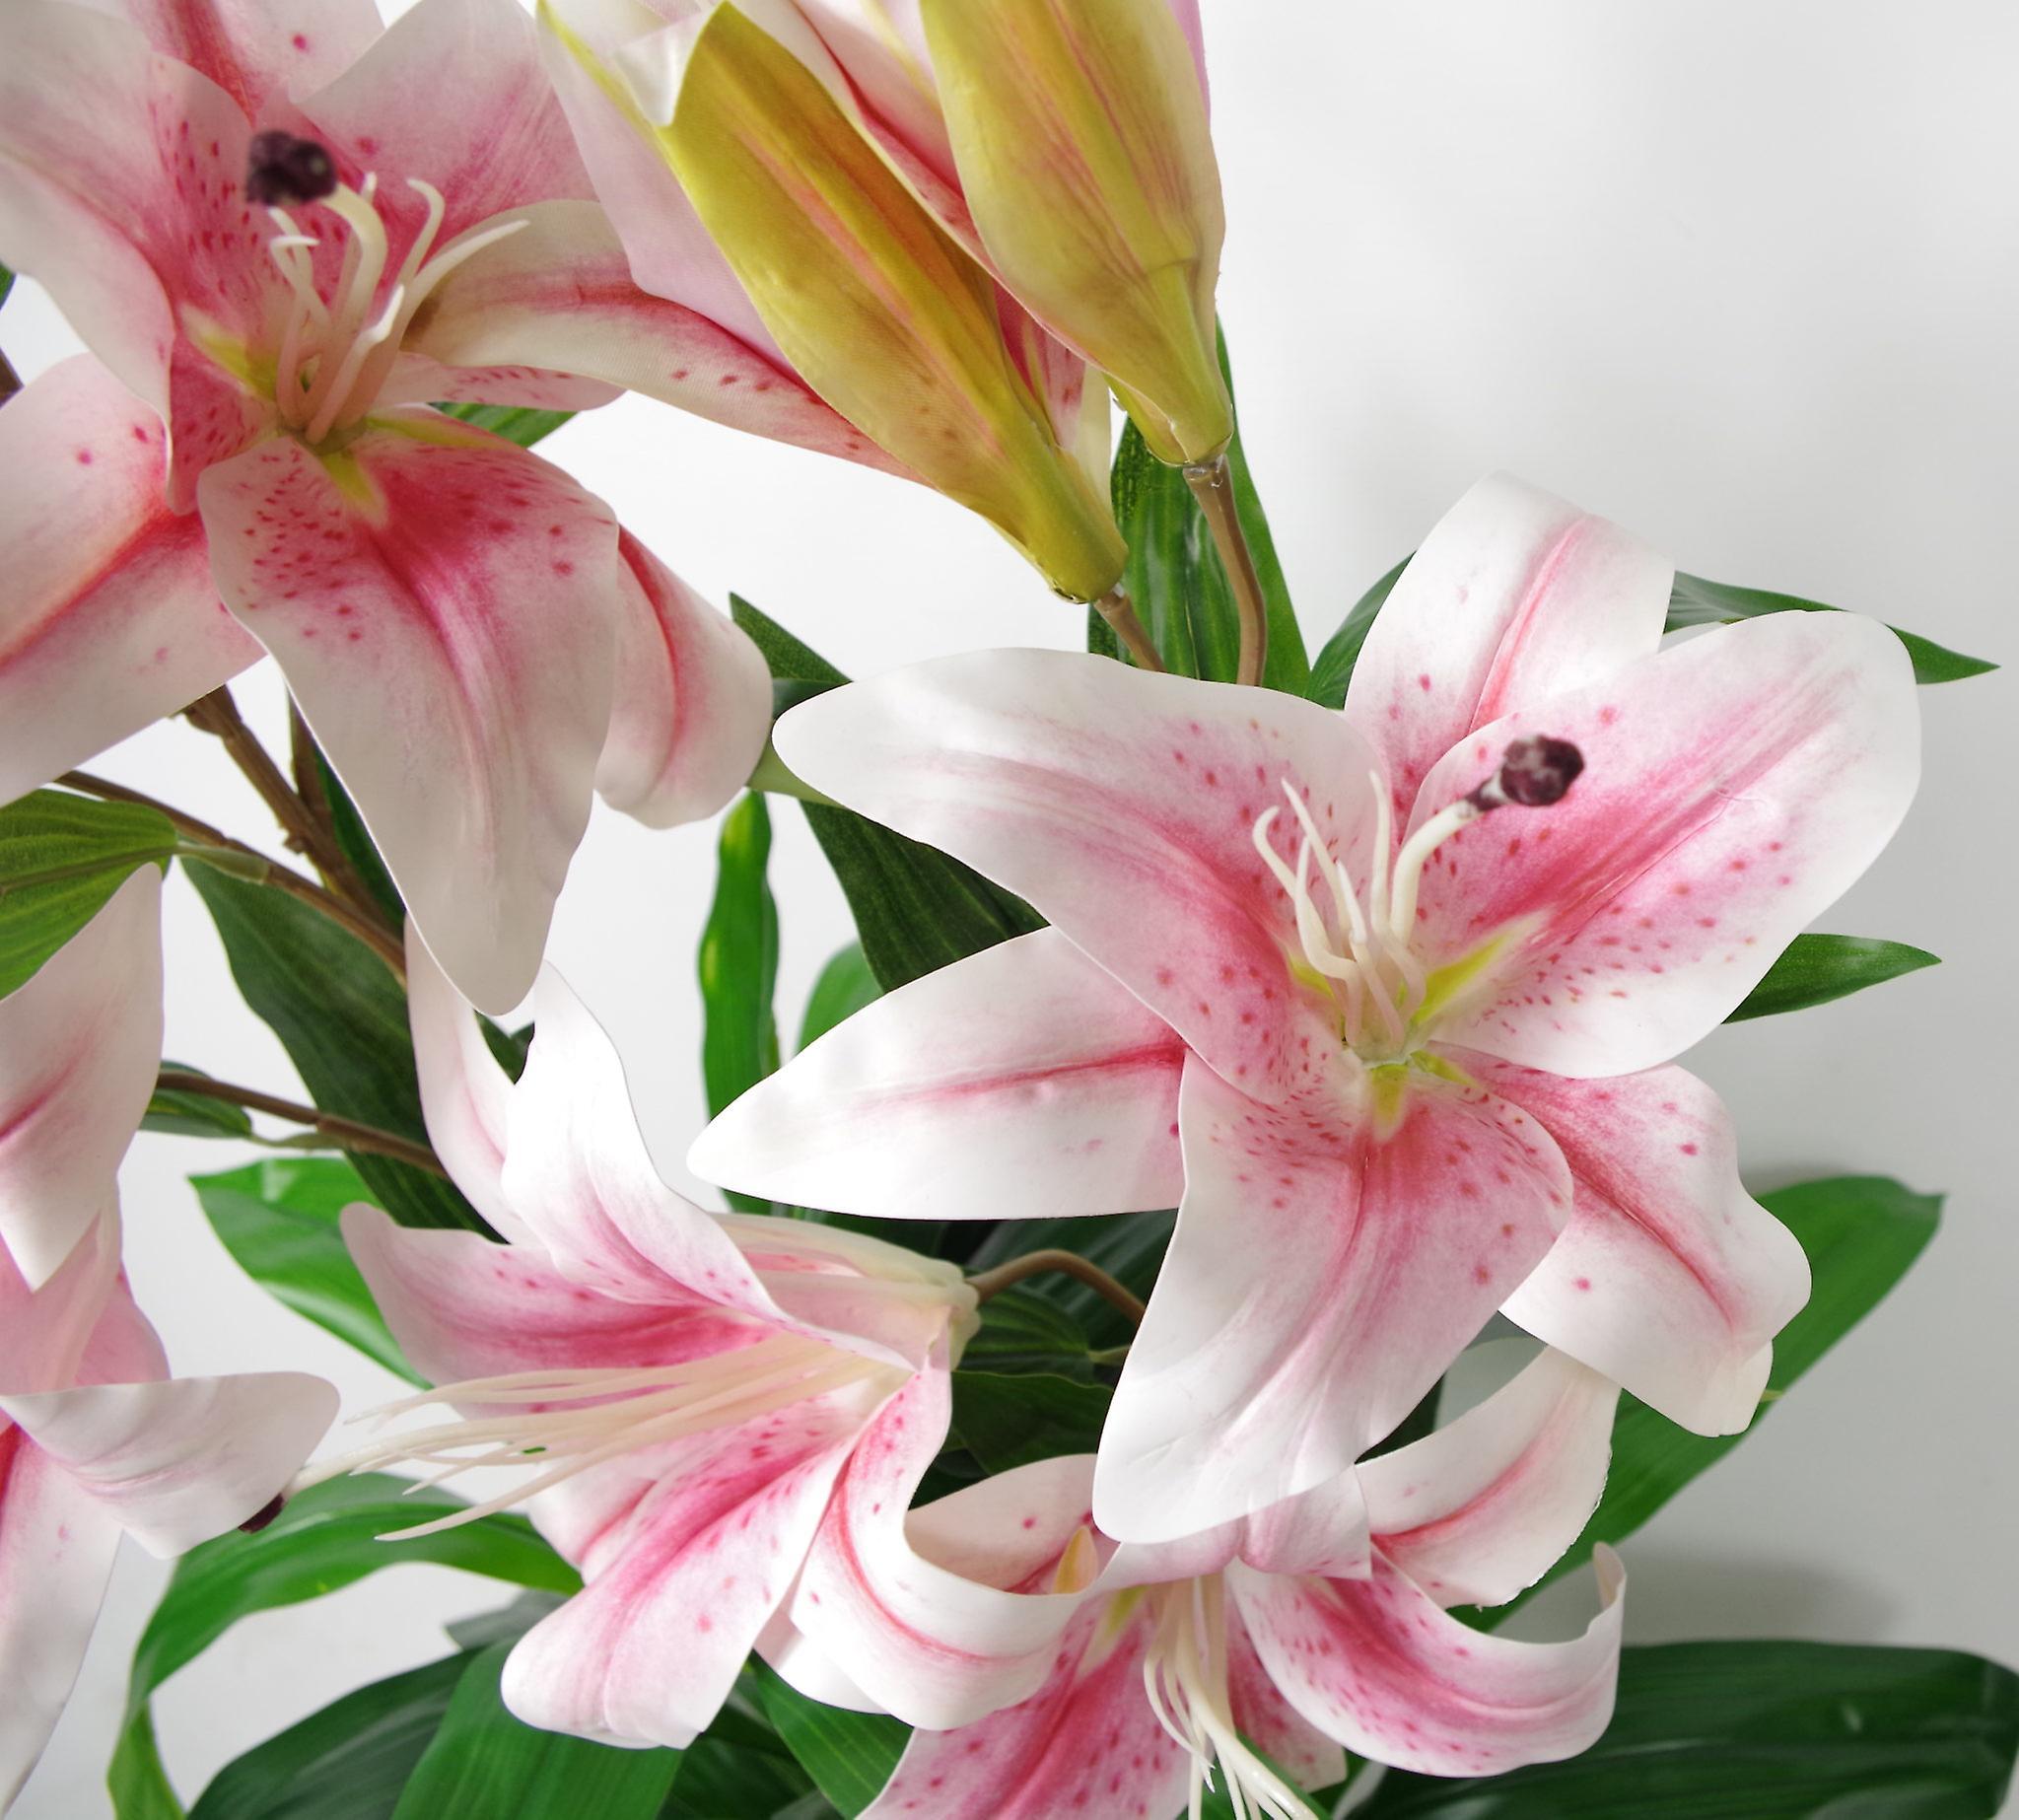 90cm (3ft) Artificial Lilies Stargazer Style Lily Plant Large Flowers